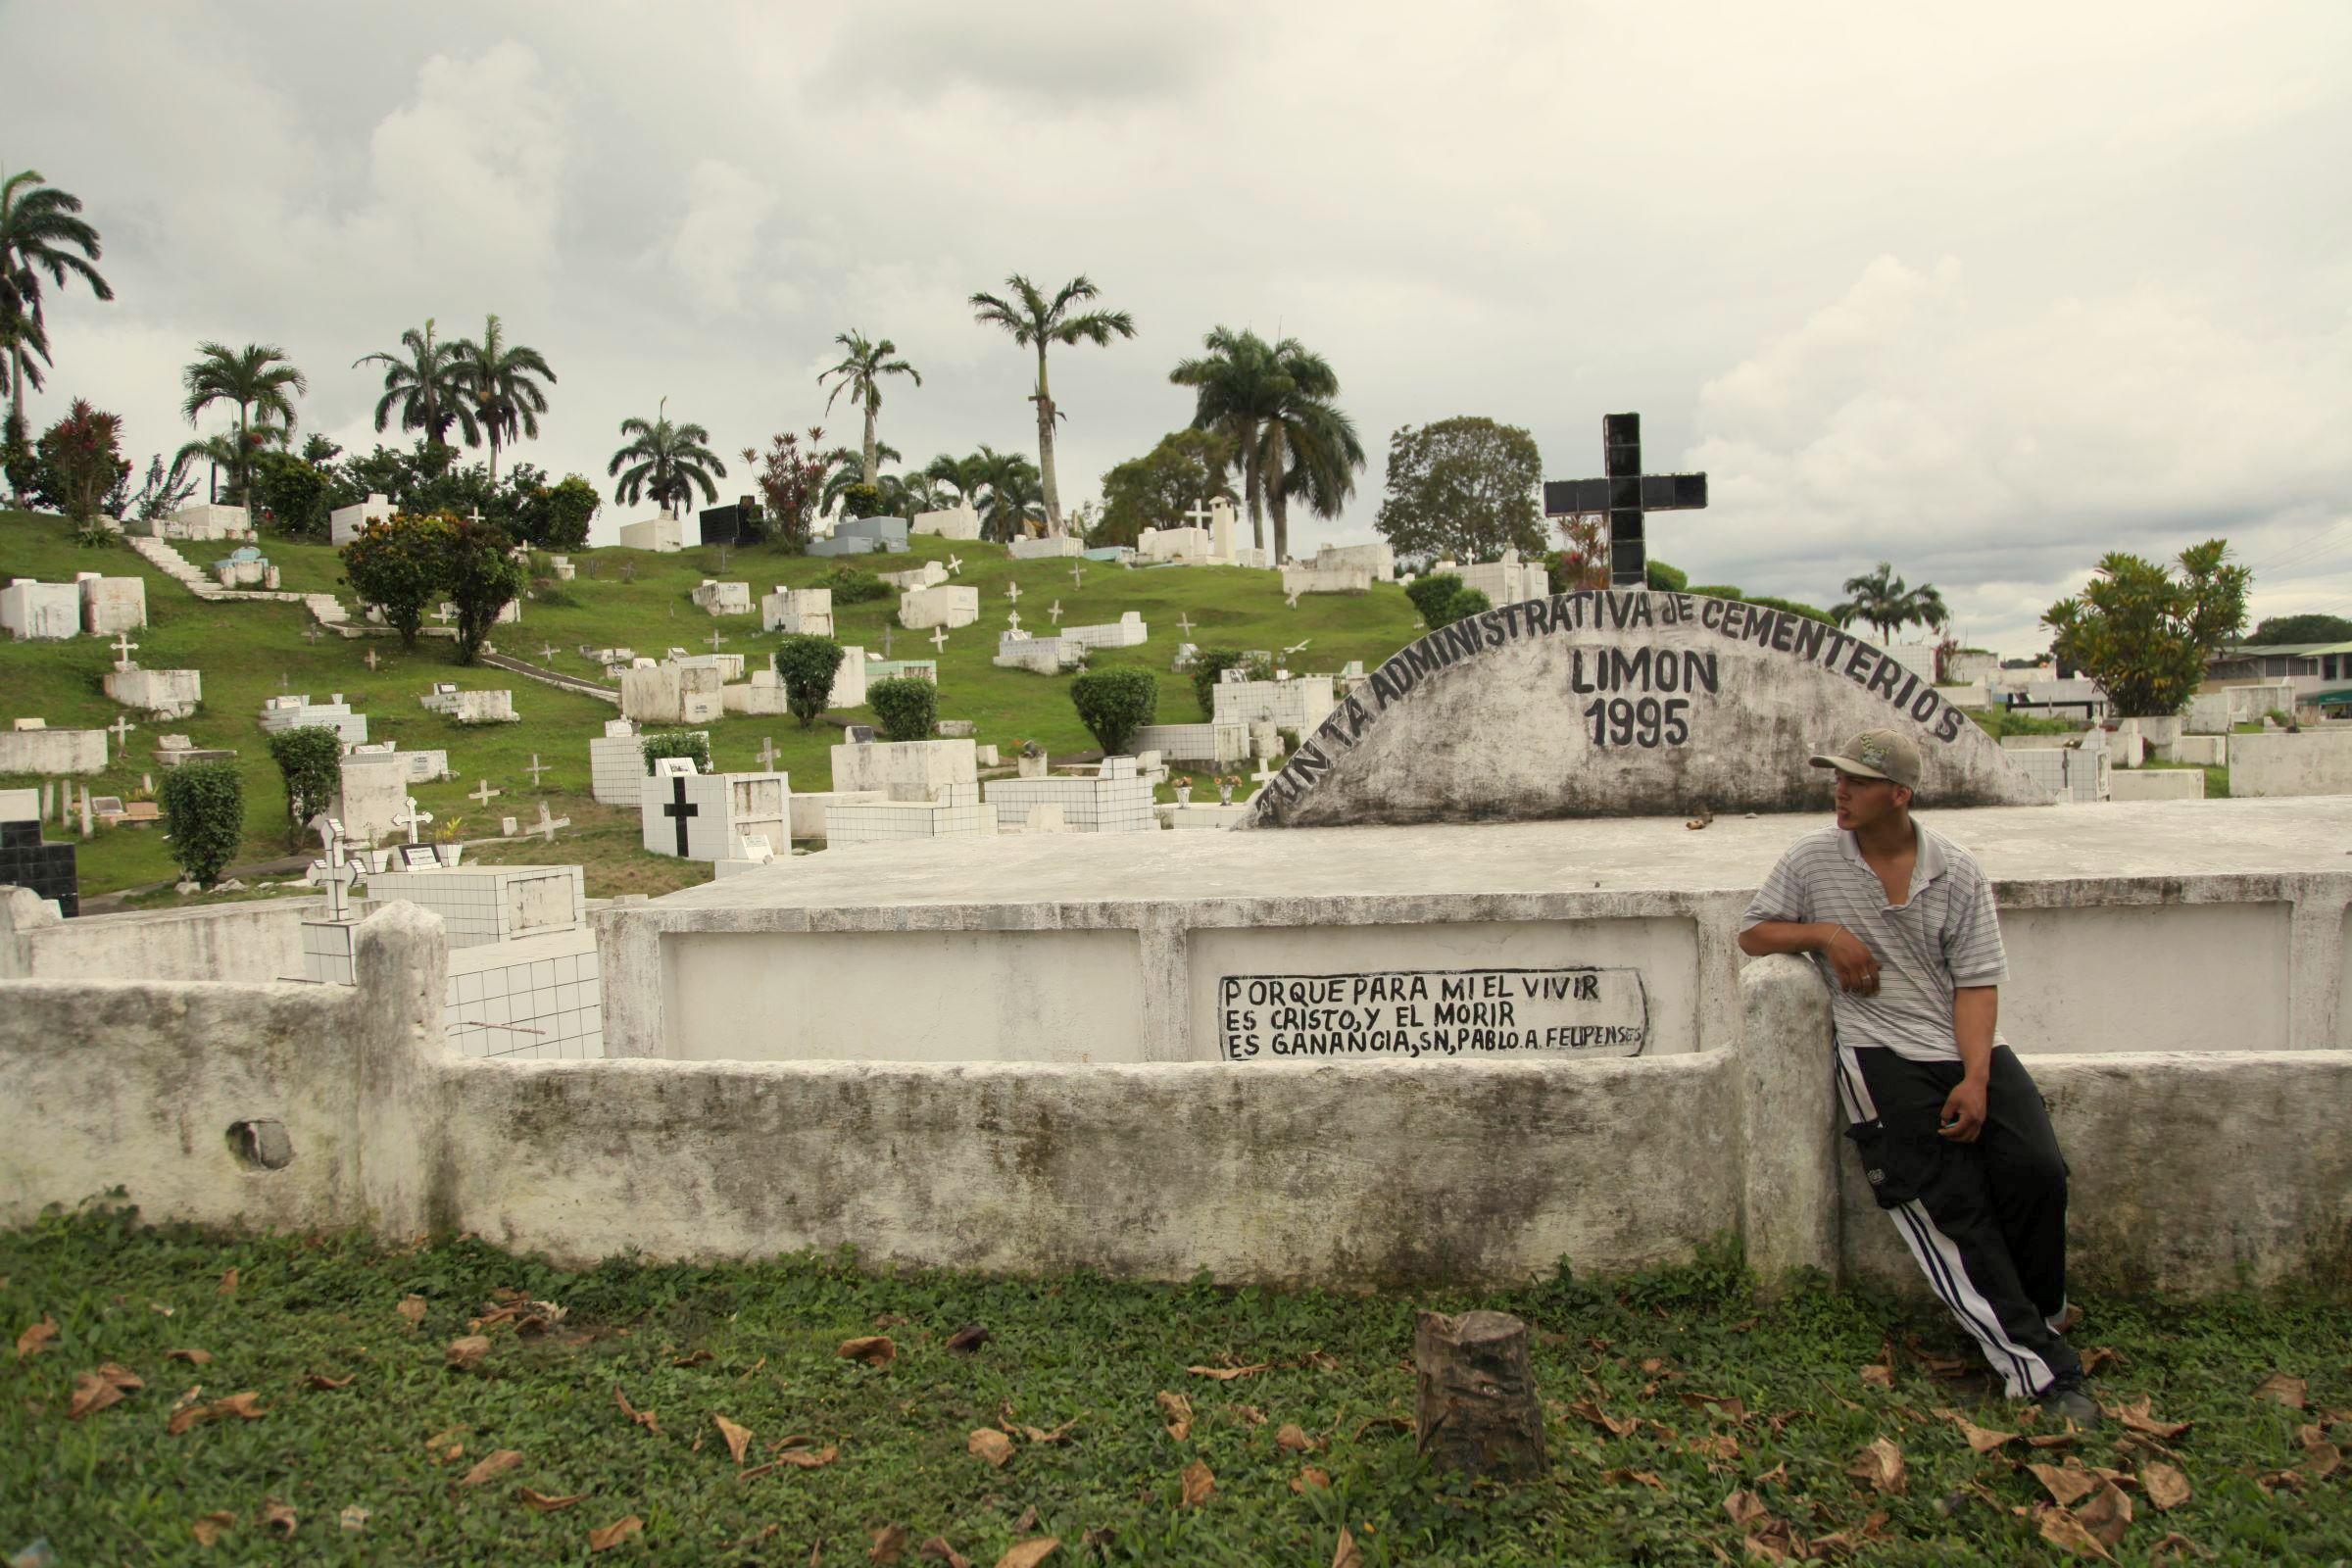 https://bubo.sk/uploads/galleries/7338/katkaliskovast_nikaragua_fotky-314.jpg